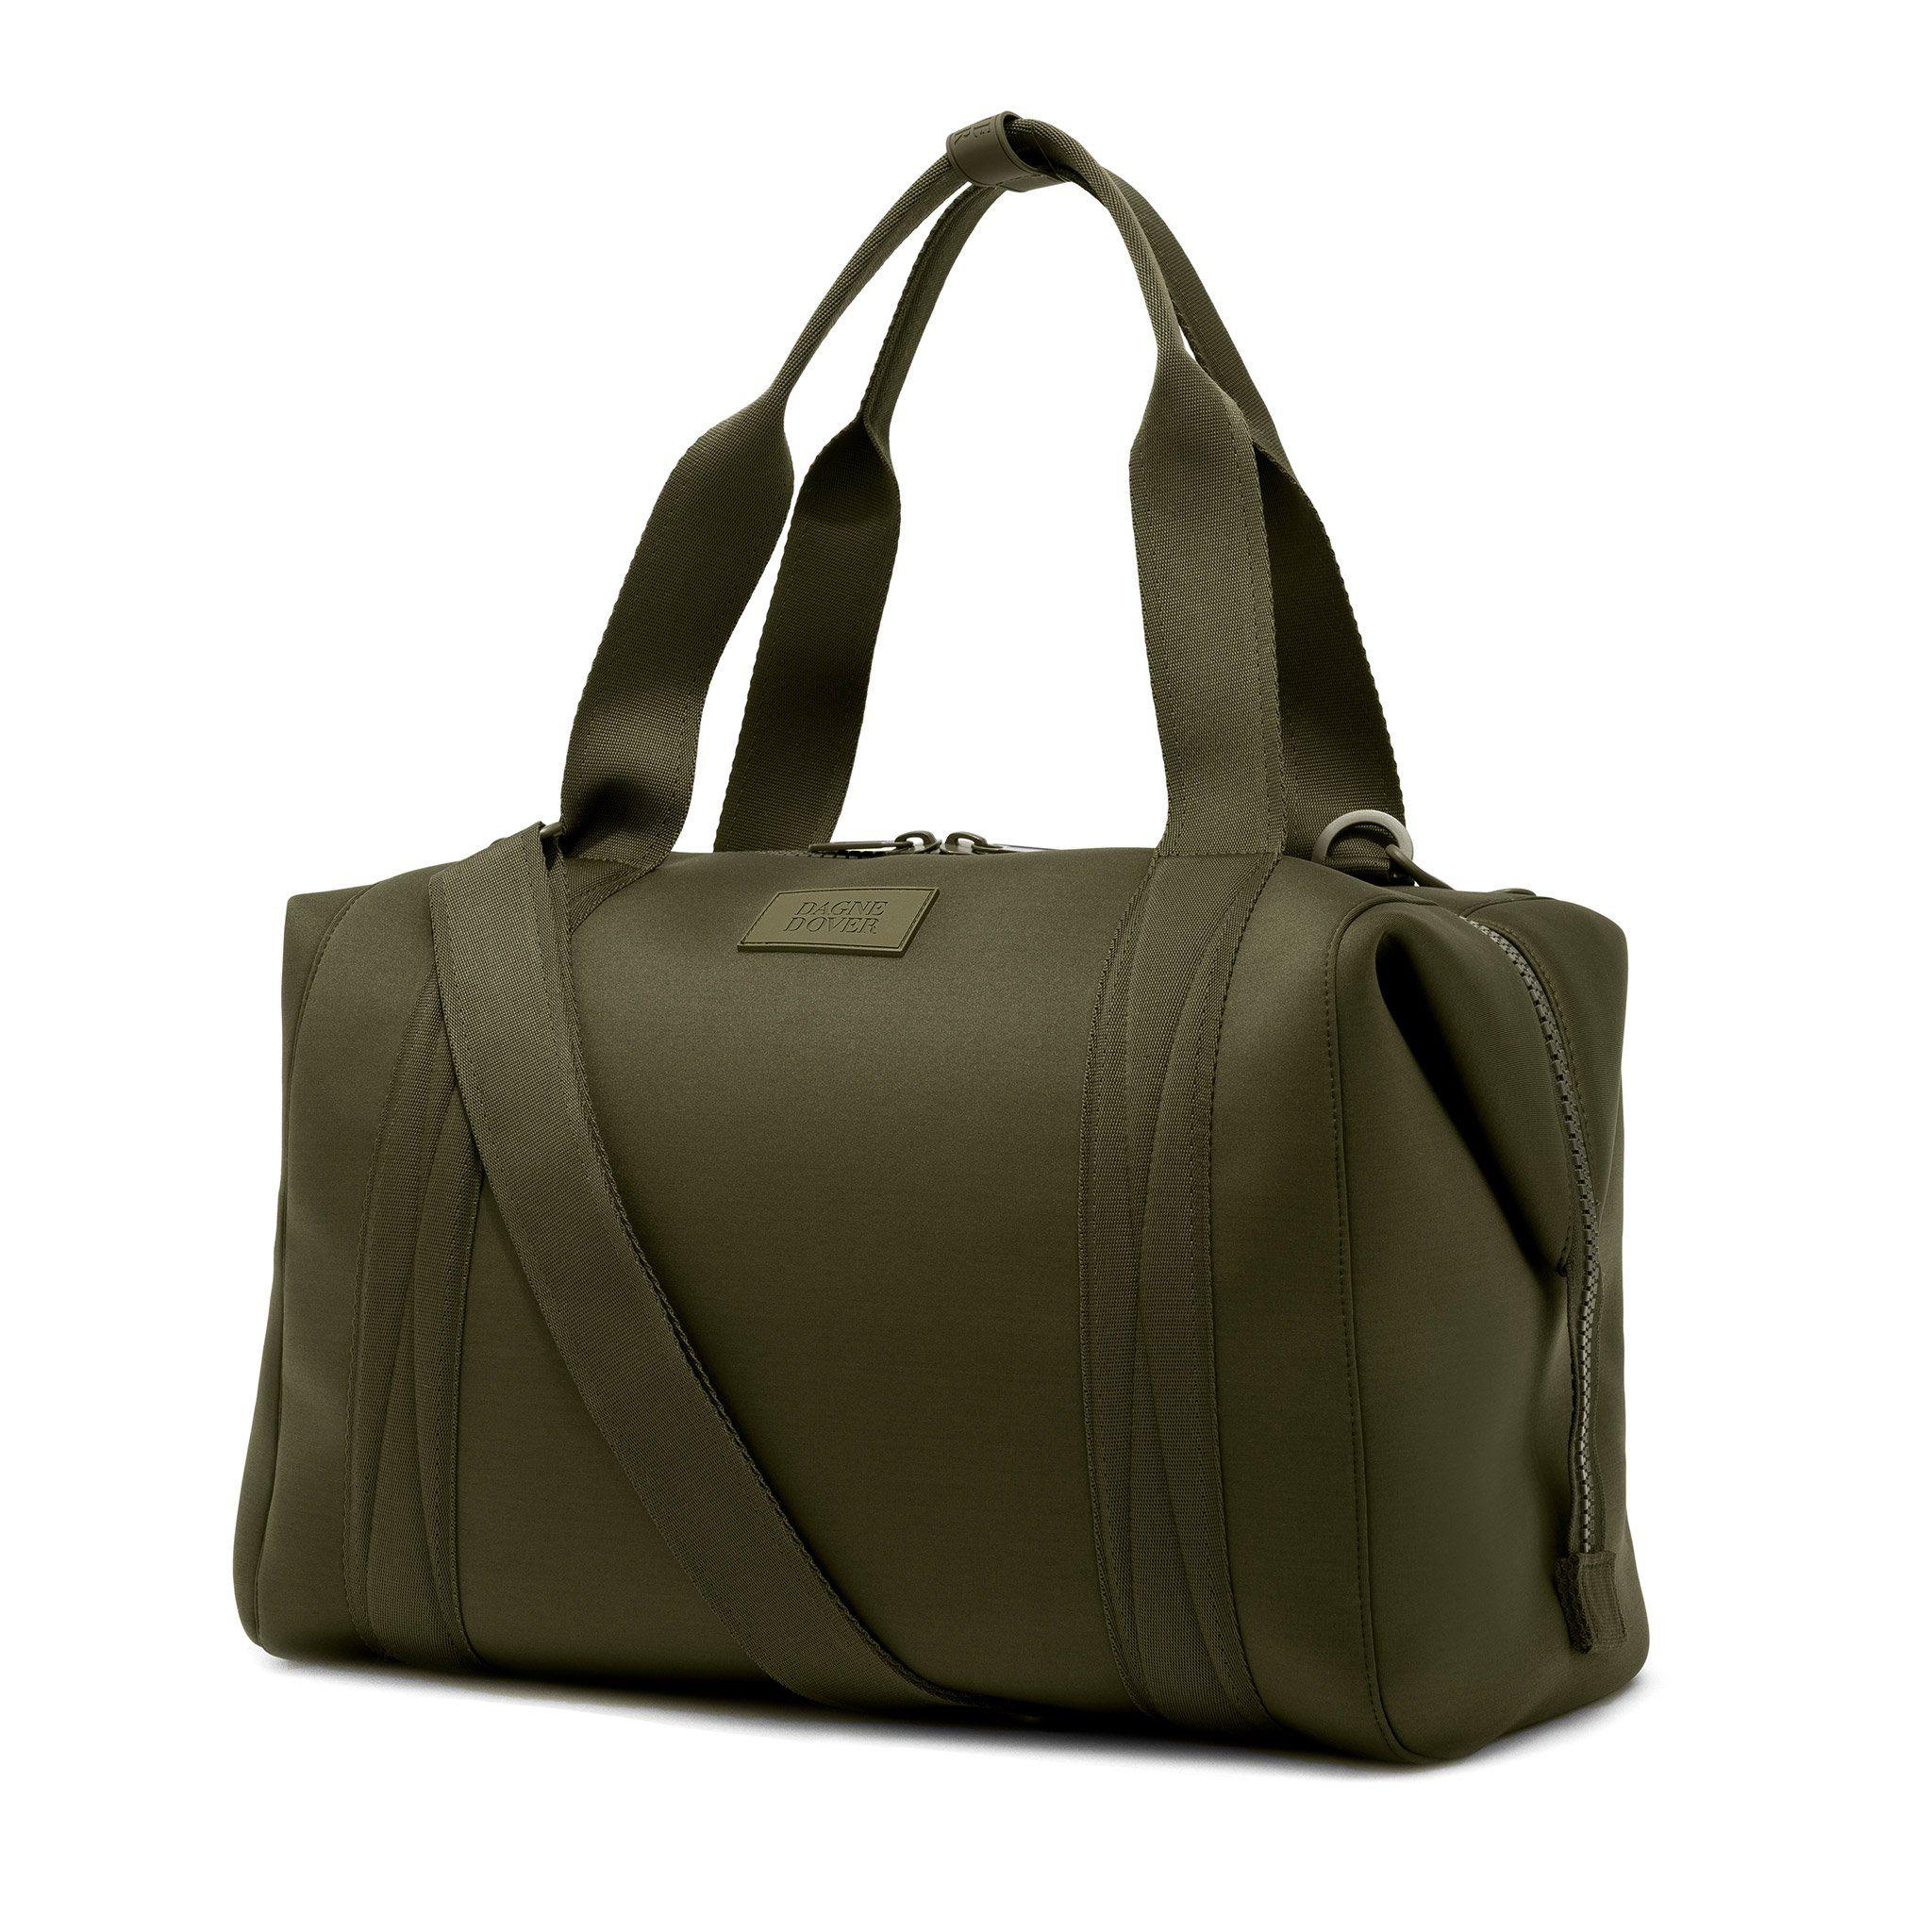 Landon carryall duffle bag weekend bag for men women